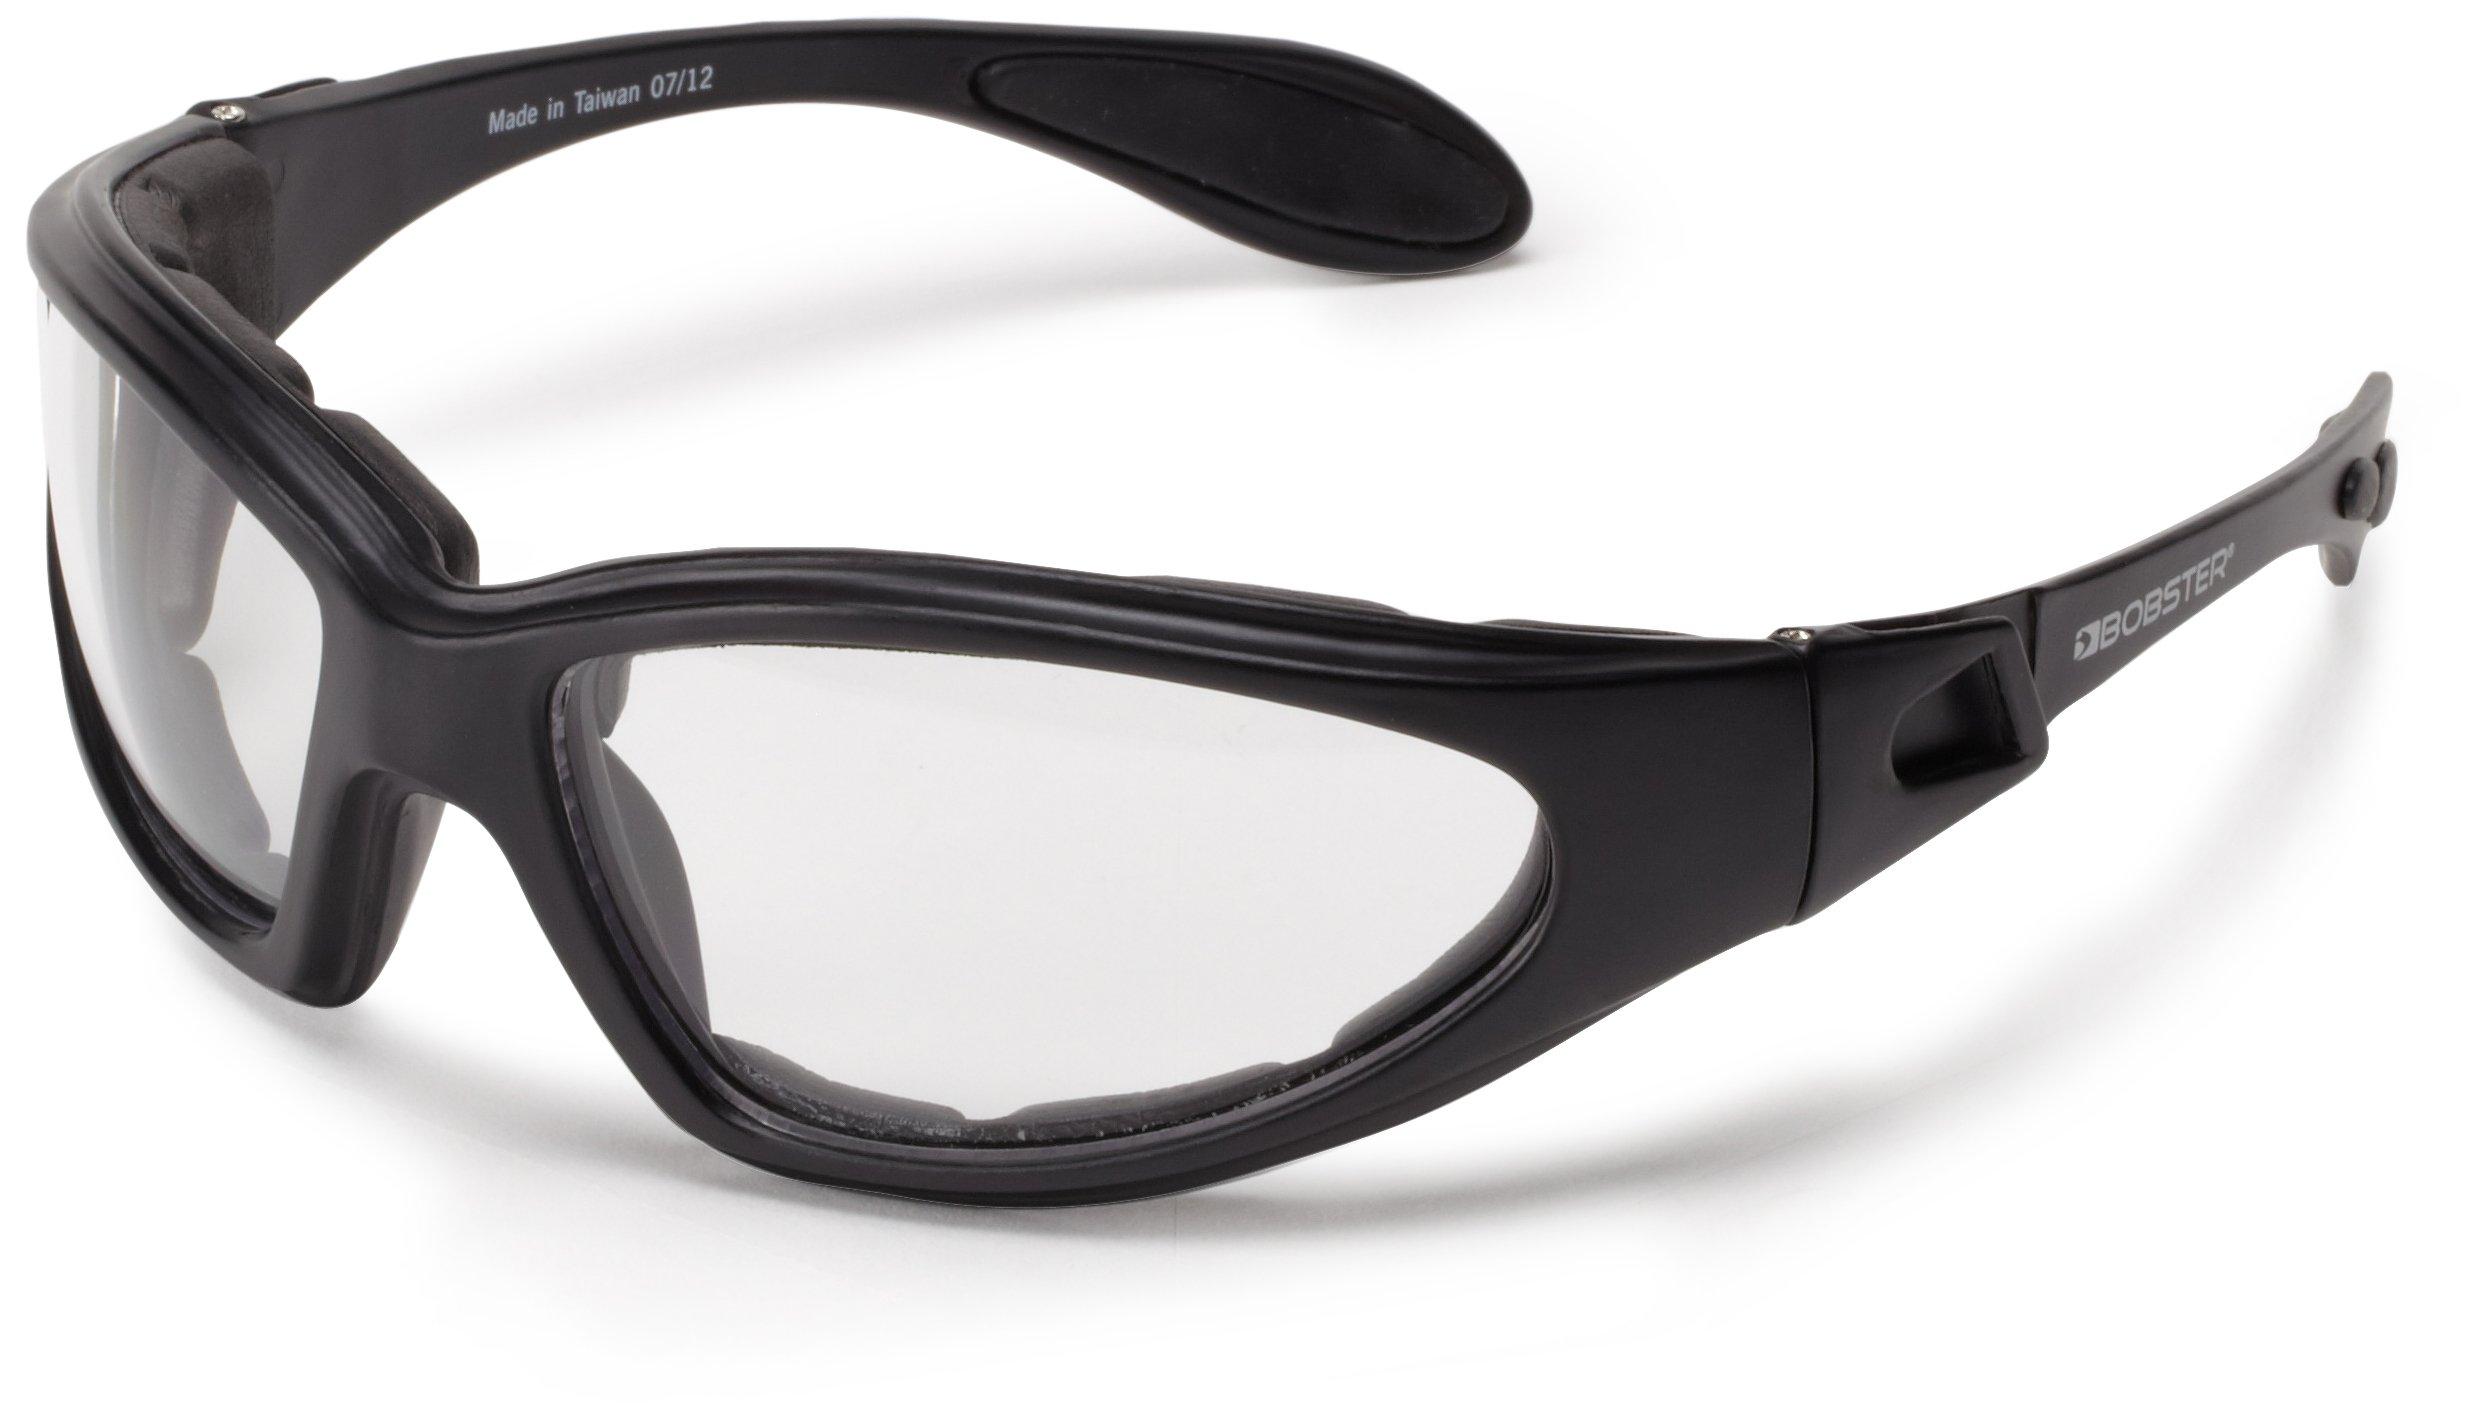 Bobster GXR Sport Sunglasses,Black Frame/Clear Lens,one size by Bobster (Image #2)